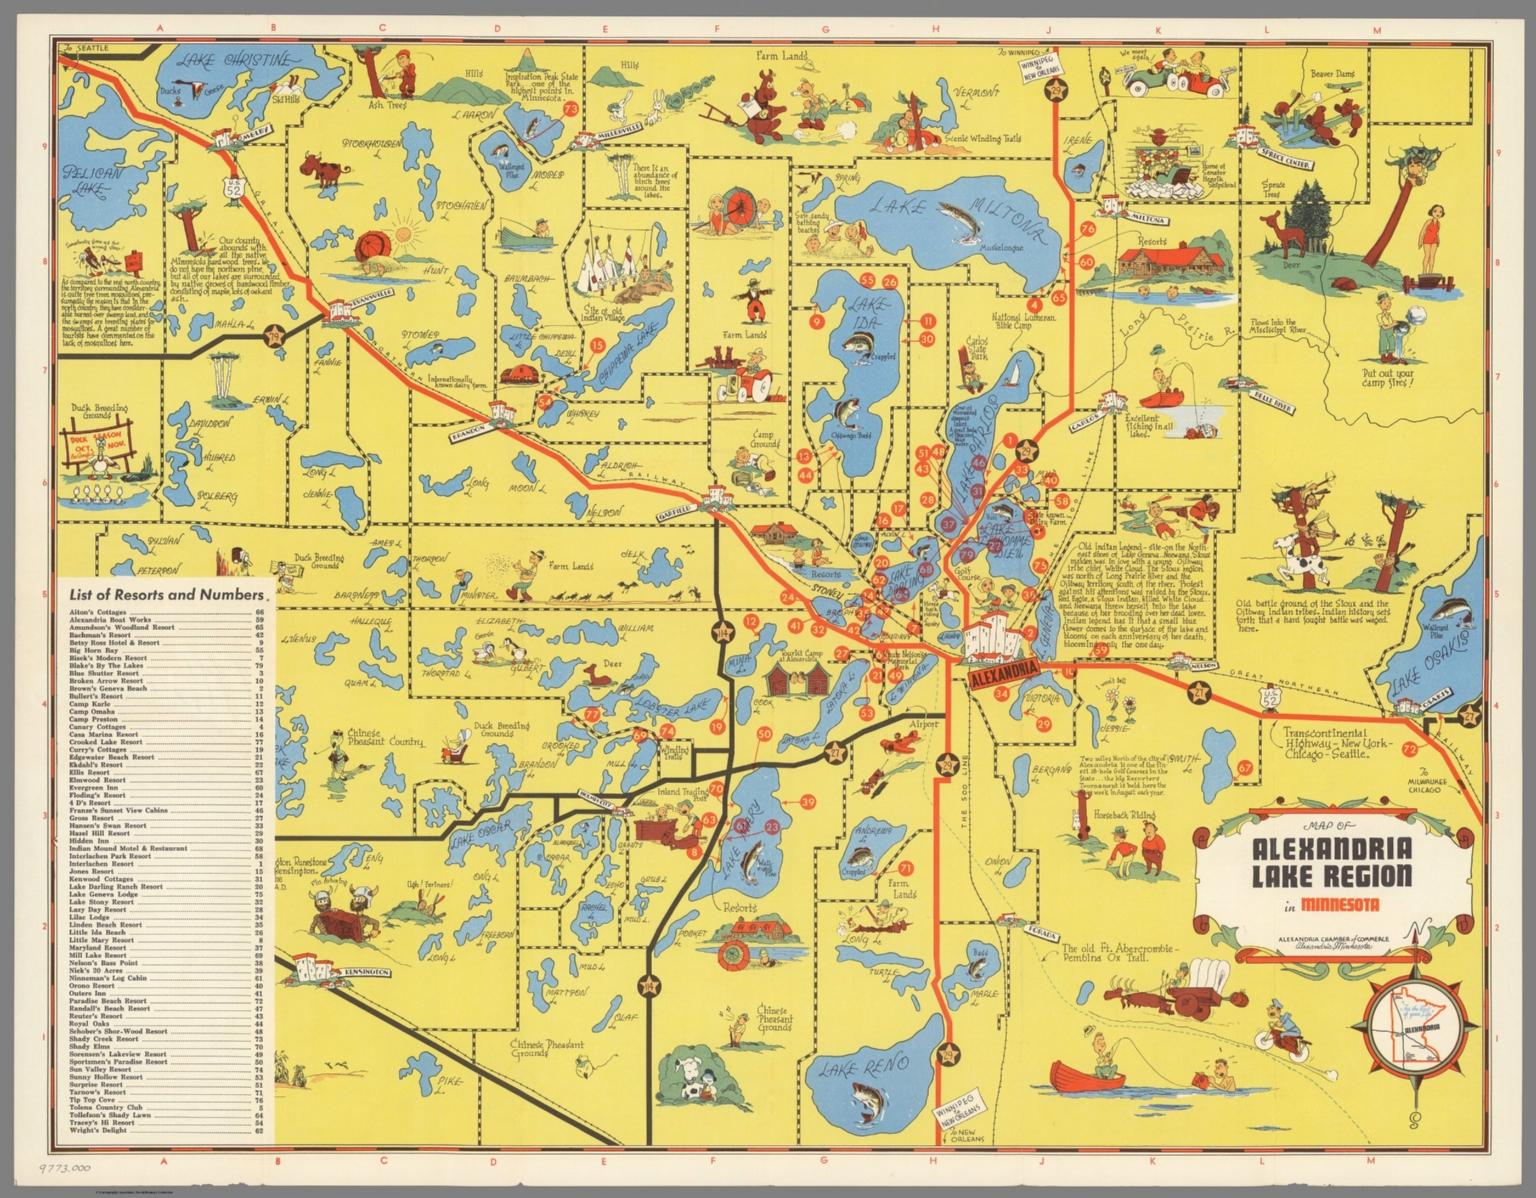 Map of Alexandria Lake Region in Minnesota David Rumsey